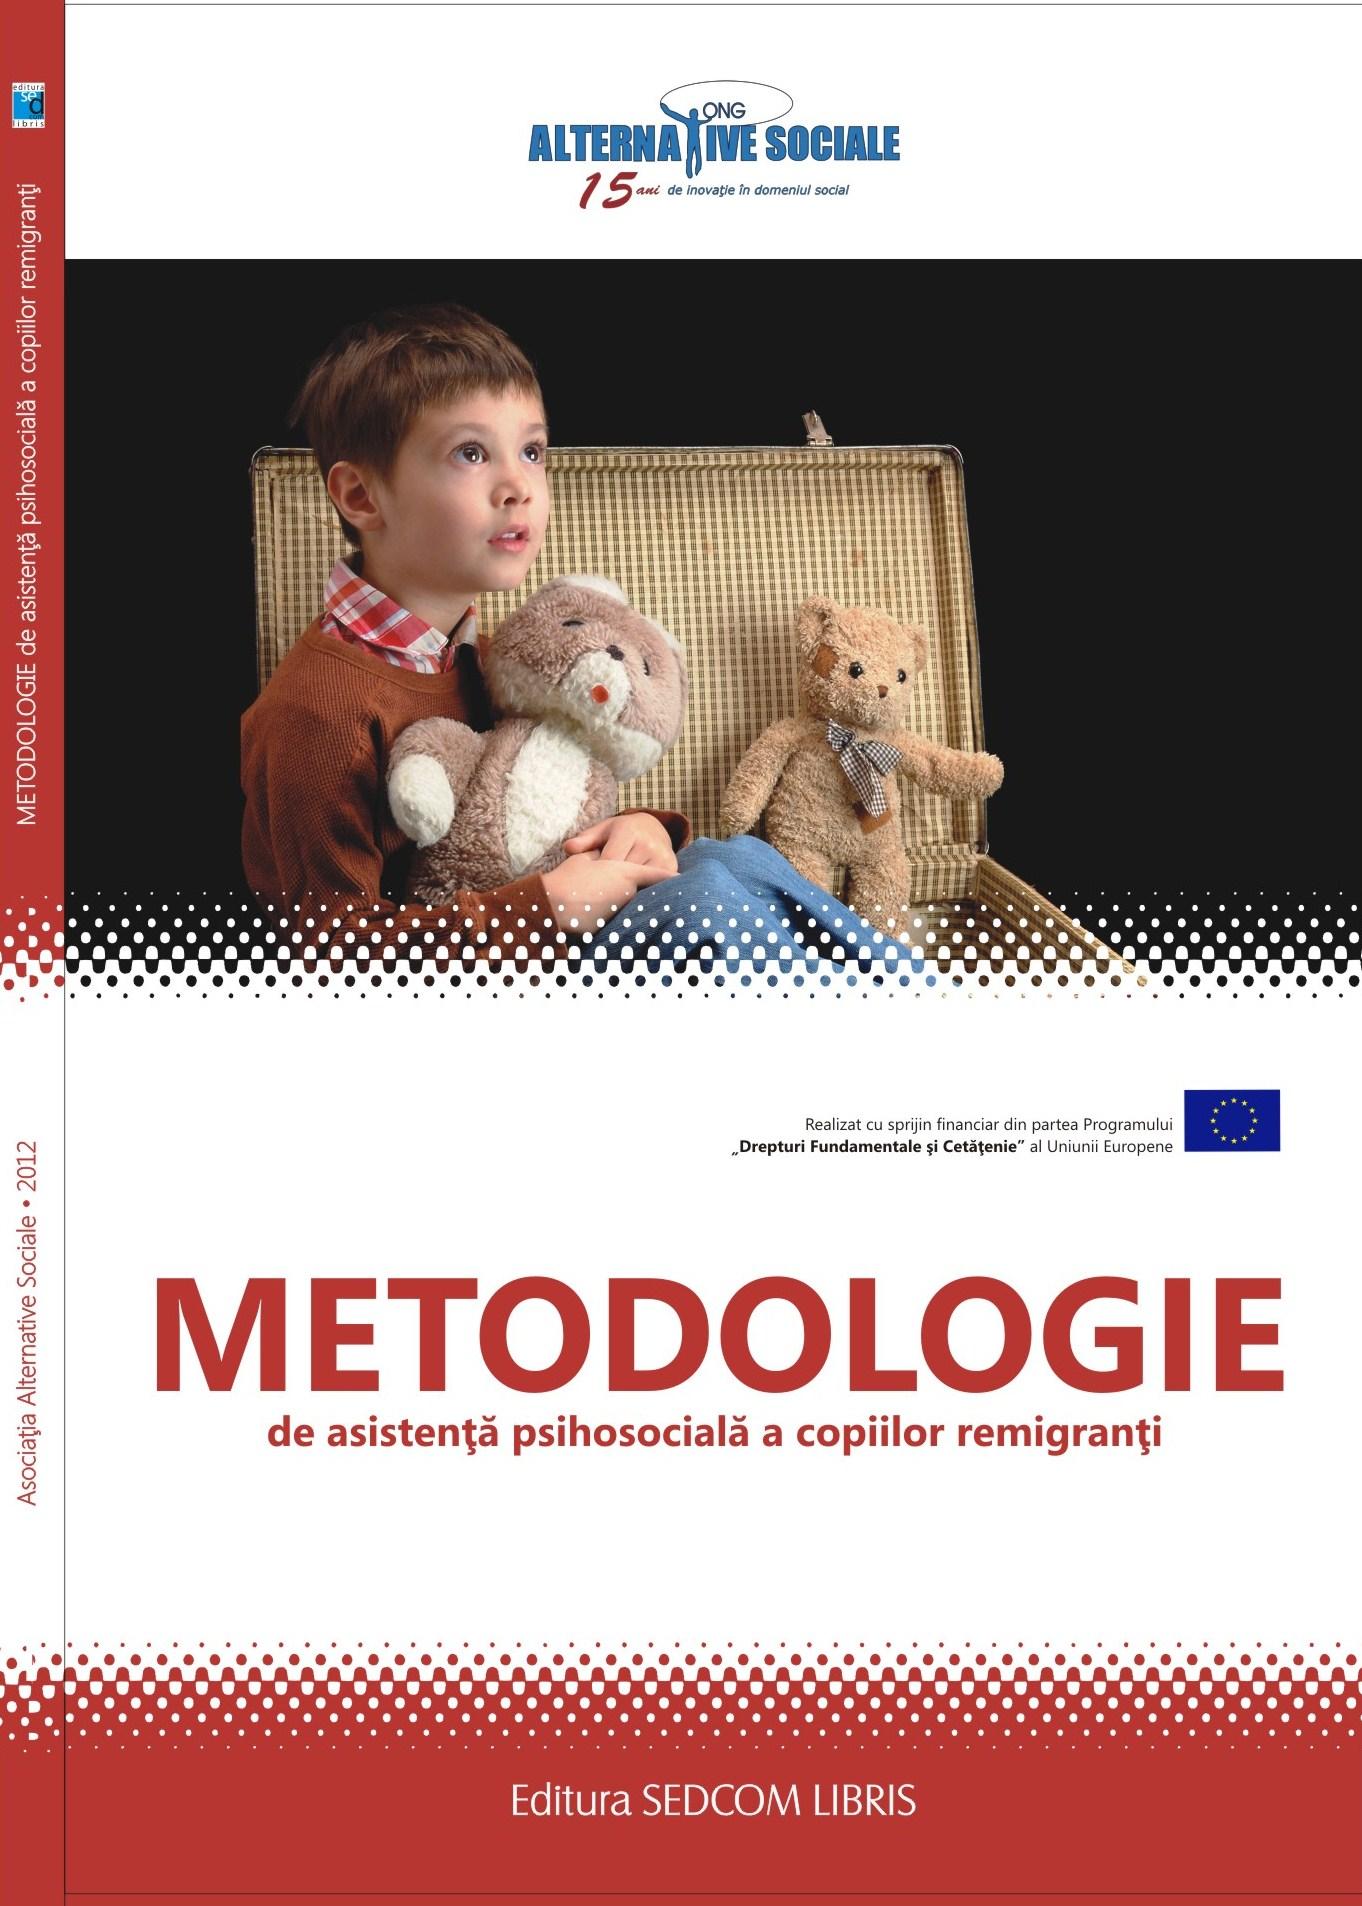 coperta metodologie RCR